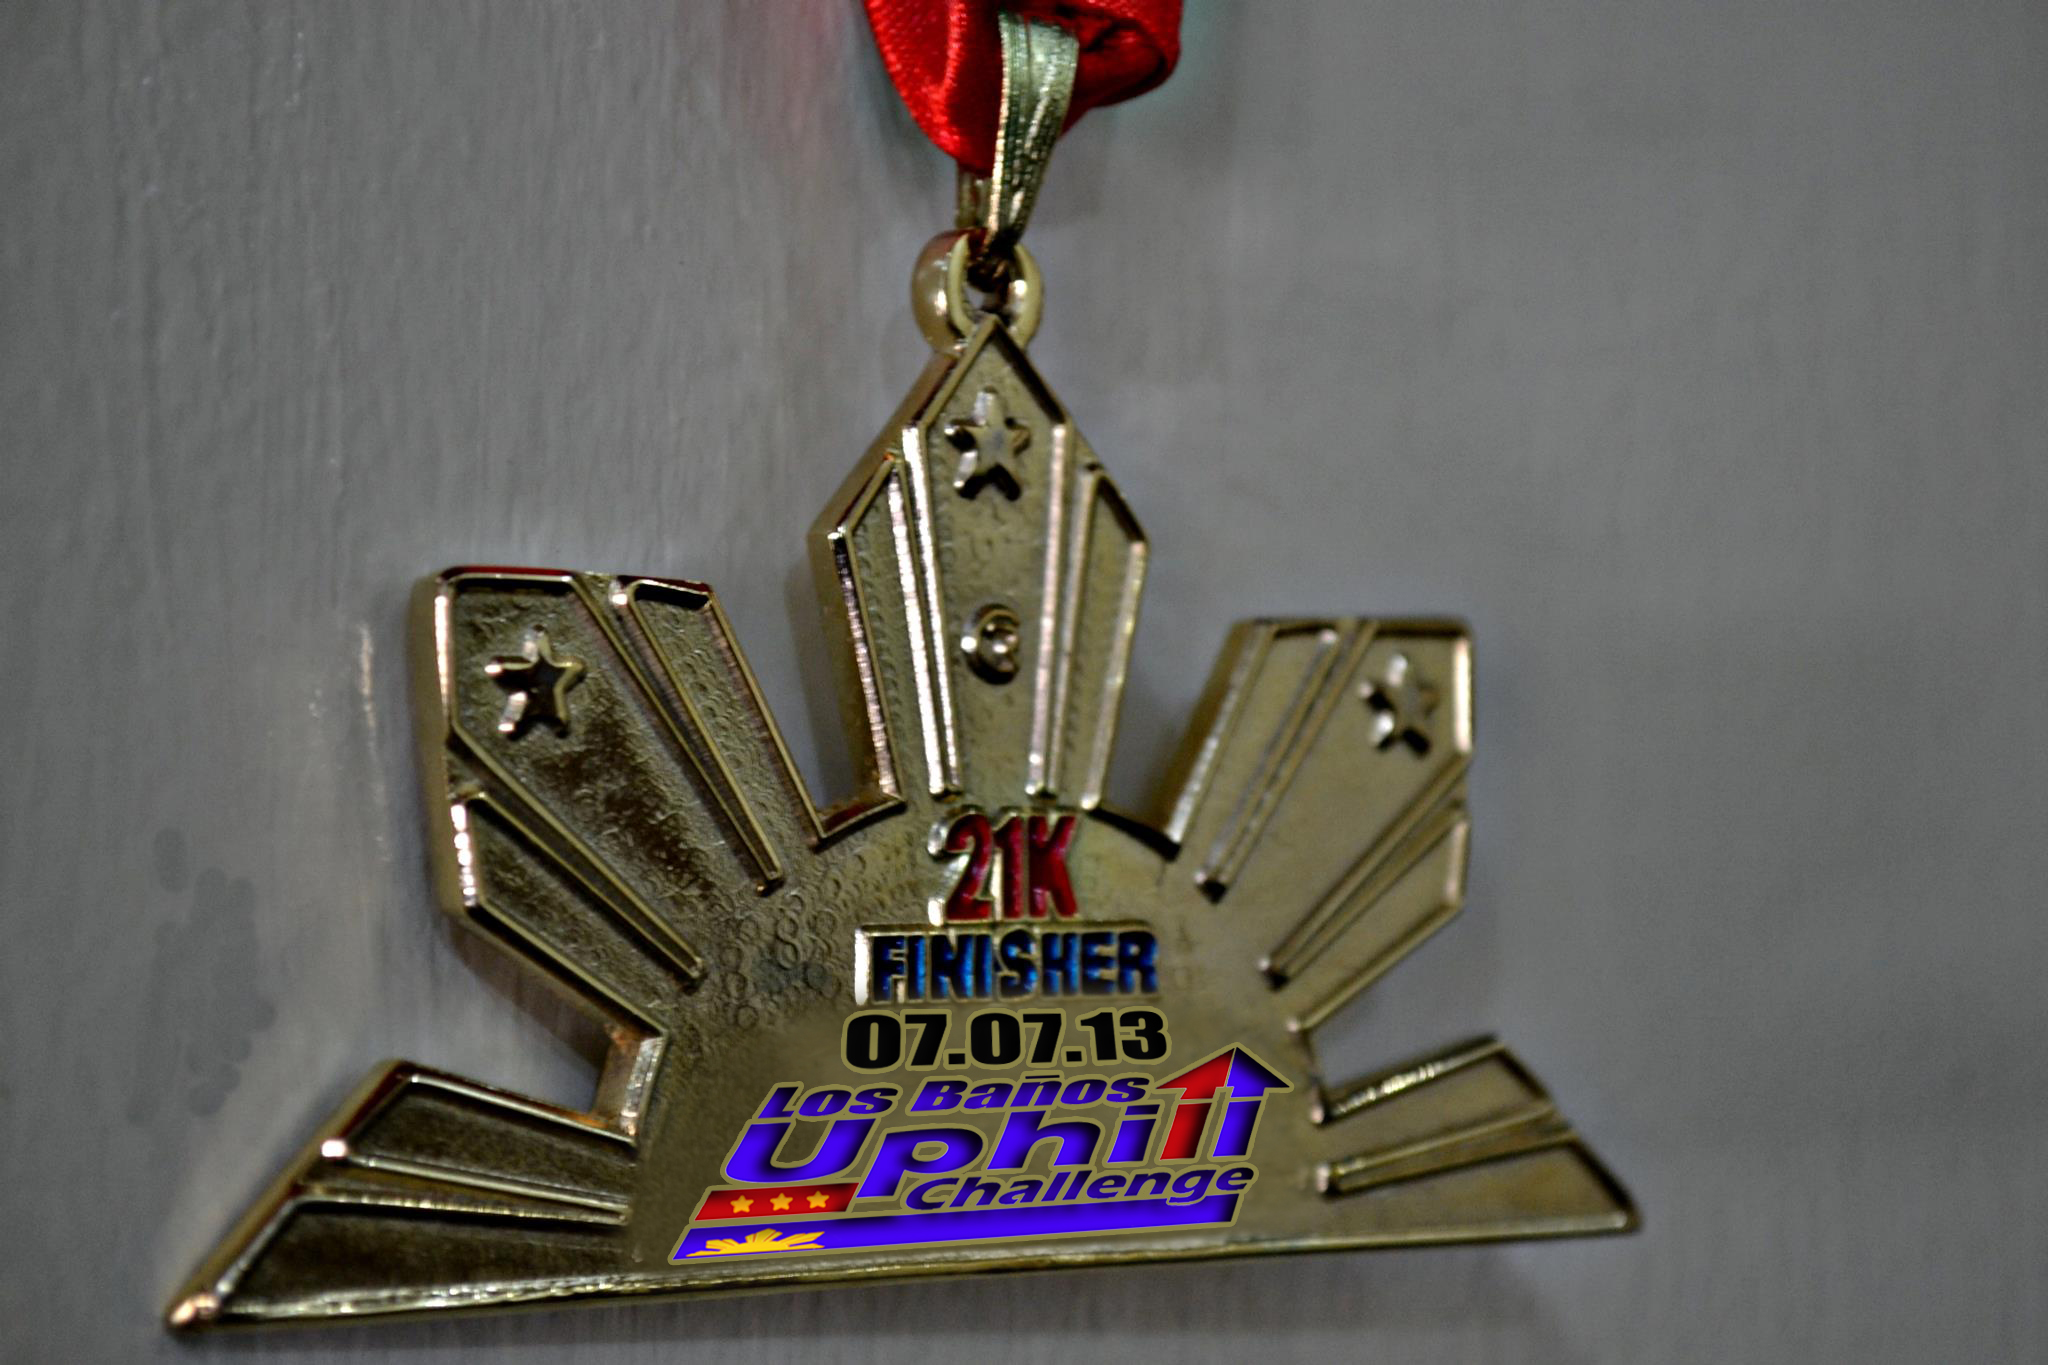 los-banos-uphill-challenge-2013-medal-design